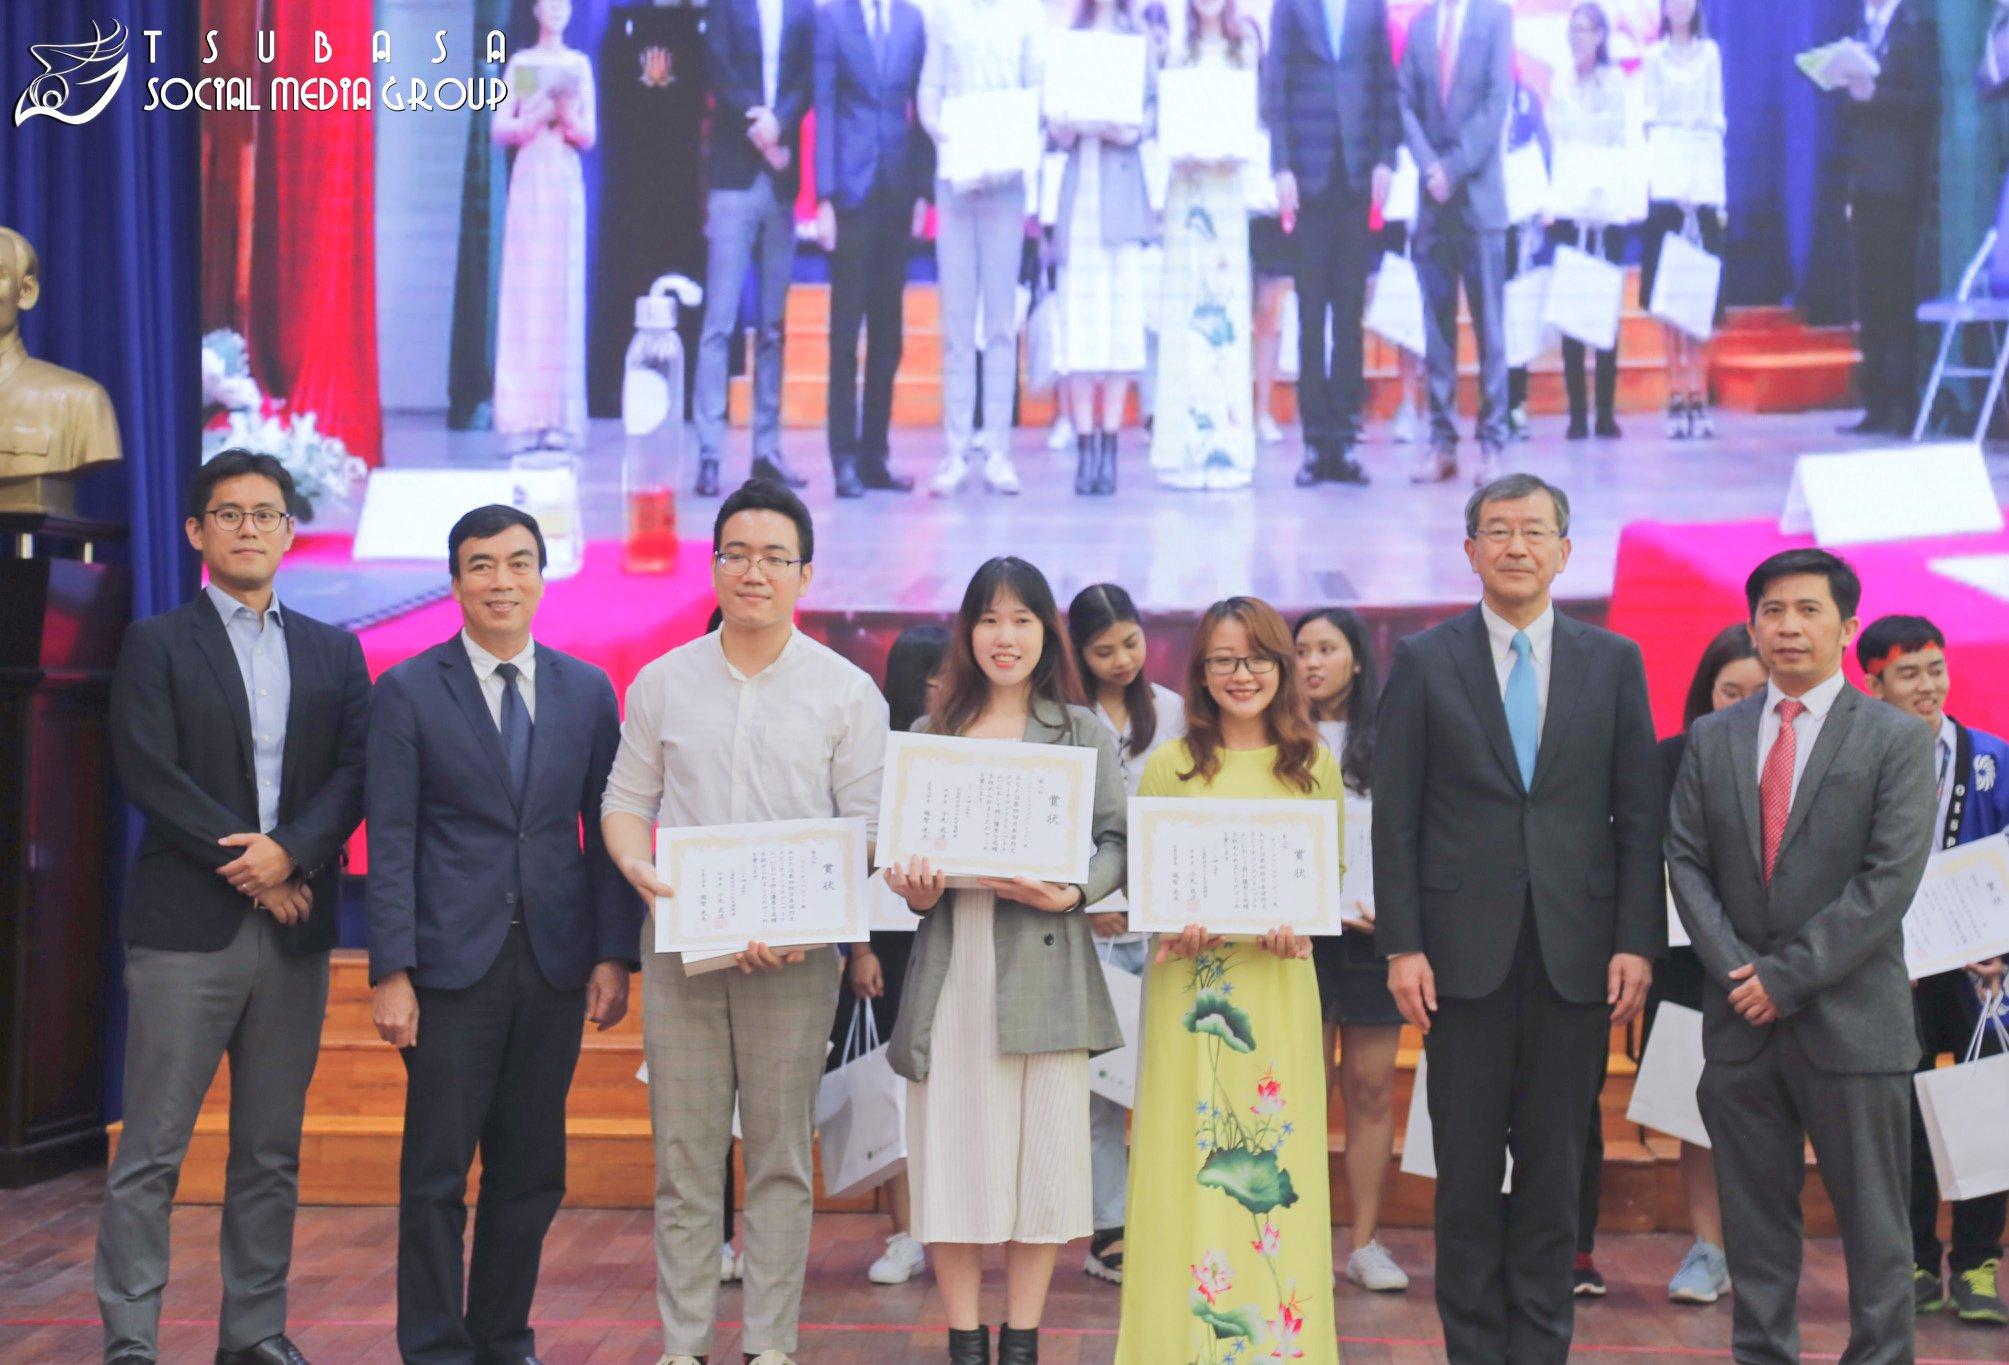 VJCC日本語コース受講者が、スピーチコンテストで第3位を受賞しました!